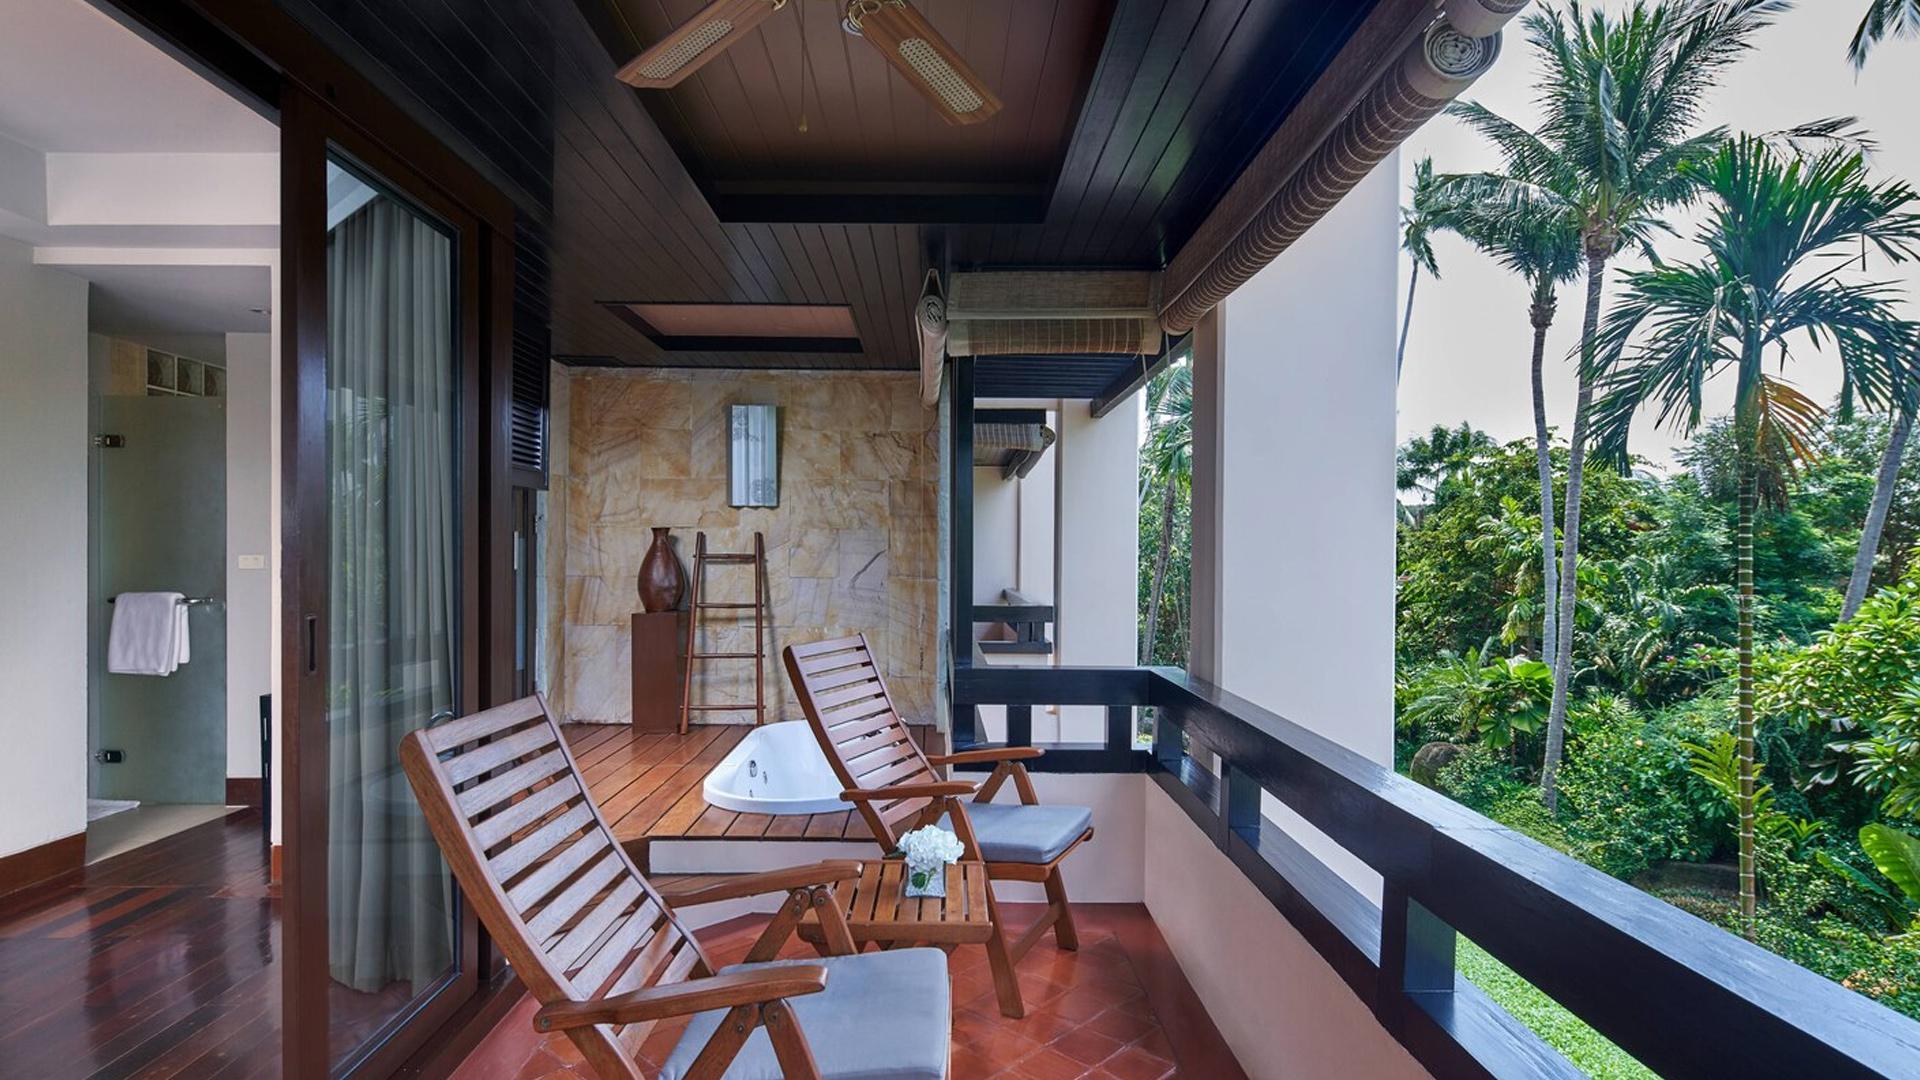 Deluxe Garden Room image 1 at Renaissance Koh Samui Resort & Spa by Amphoe Ko Samui, Chang Wat Surat Thani, Thailand